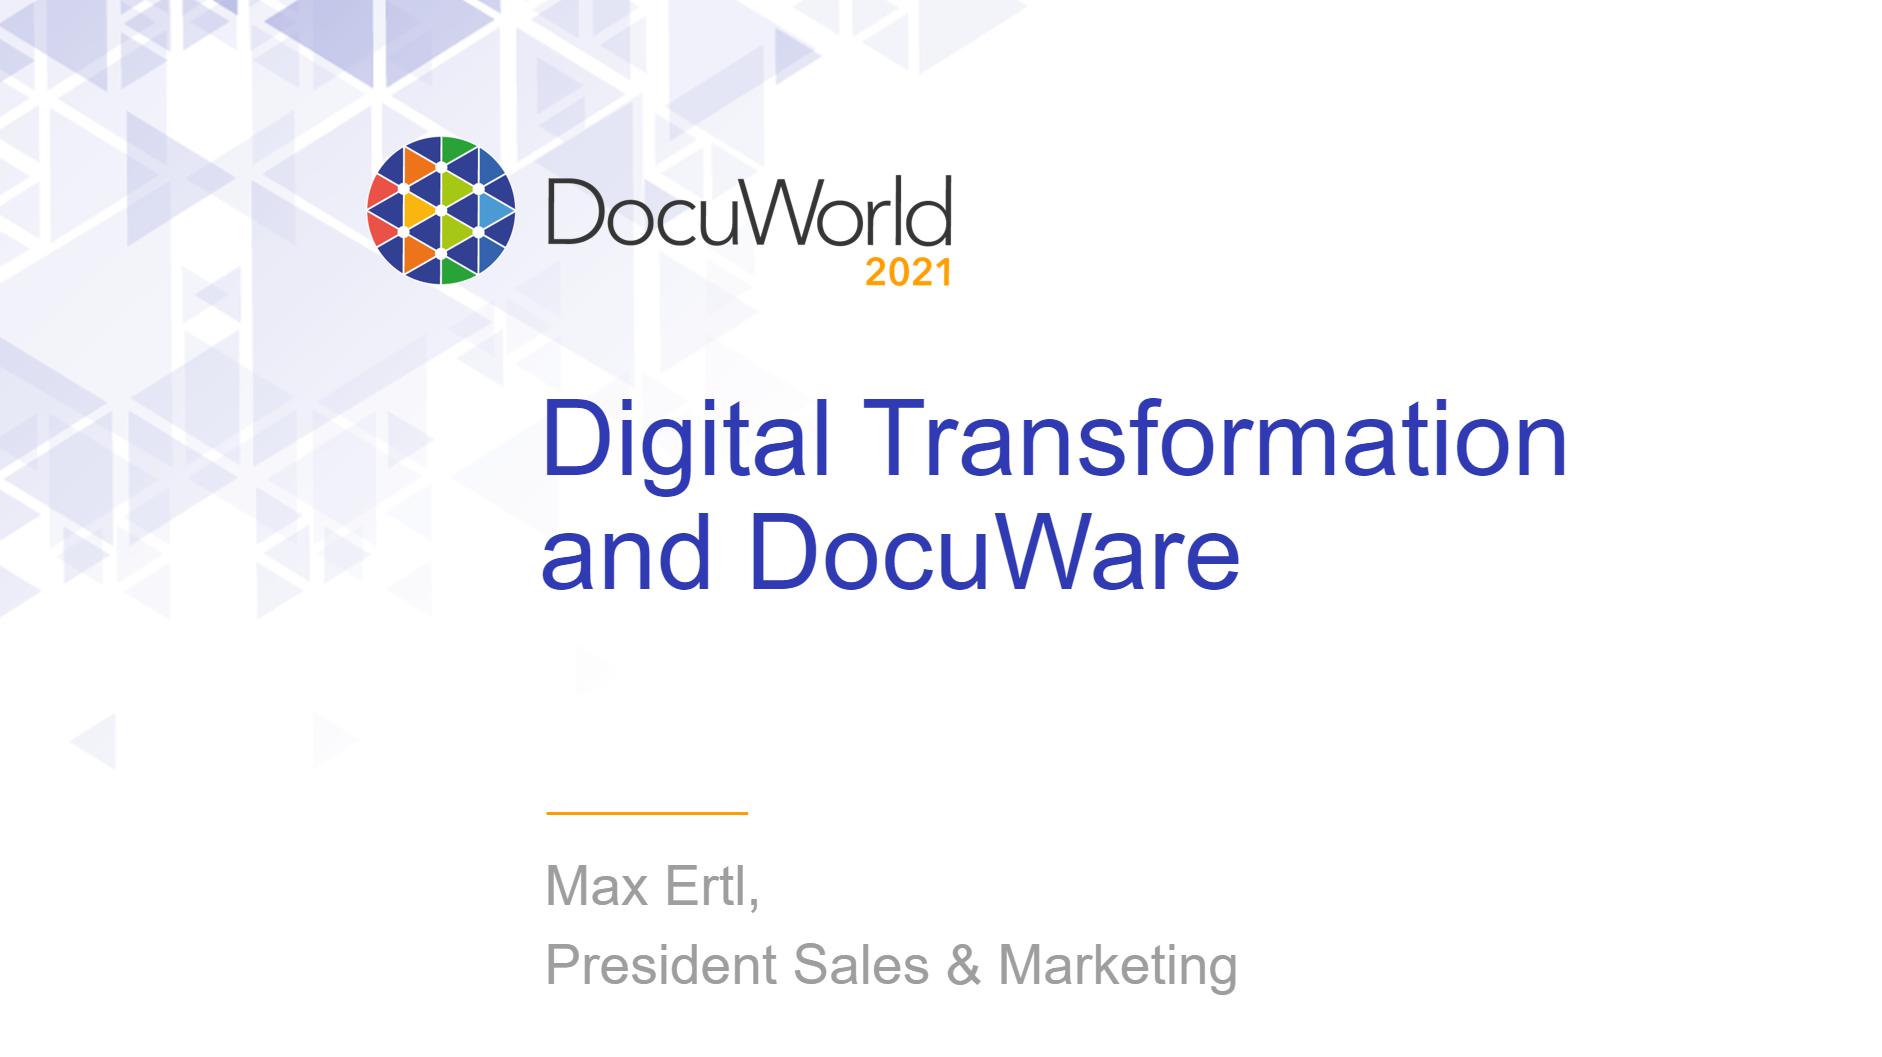 DocuWorld Partner Conference 2021: Digital Transformation